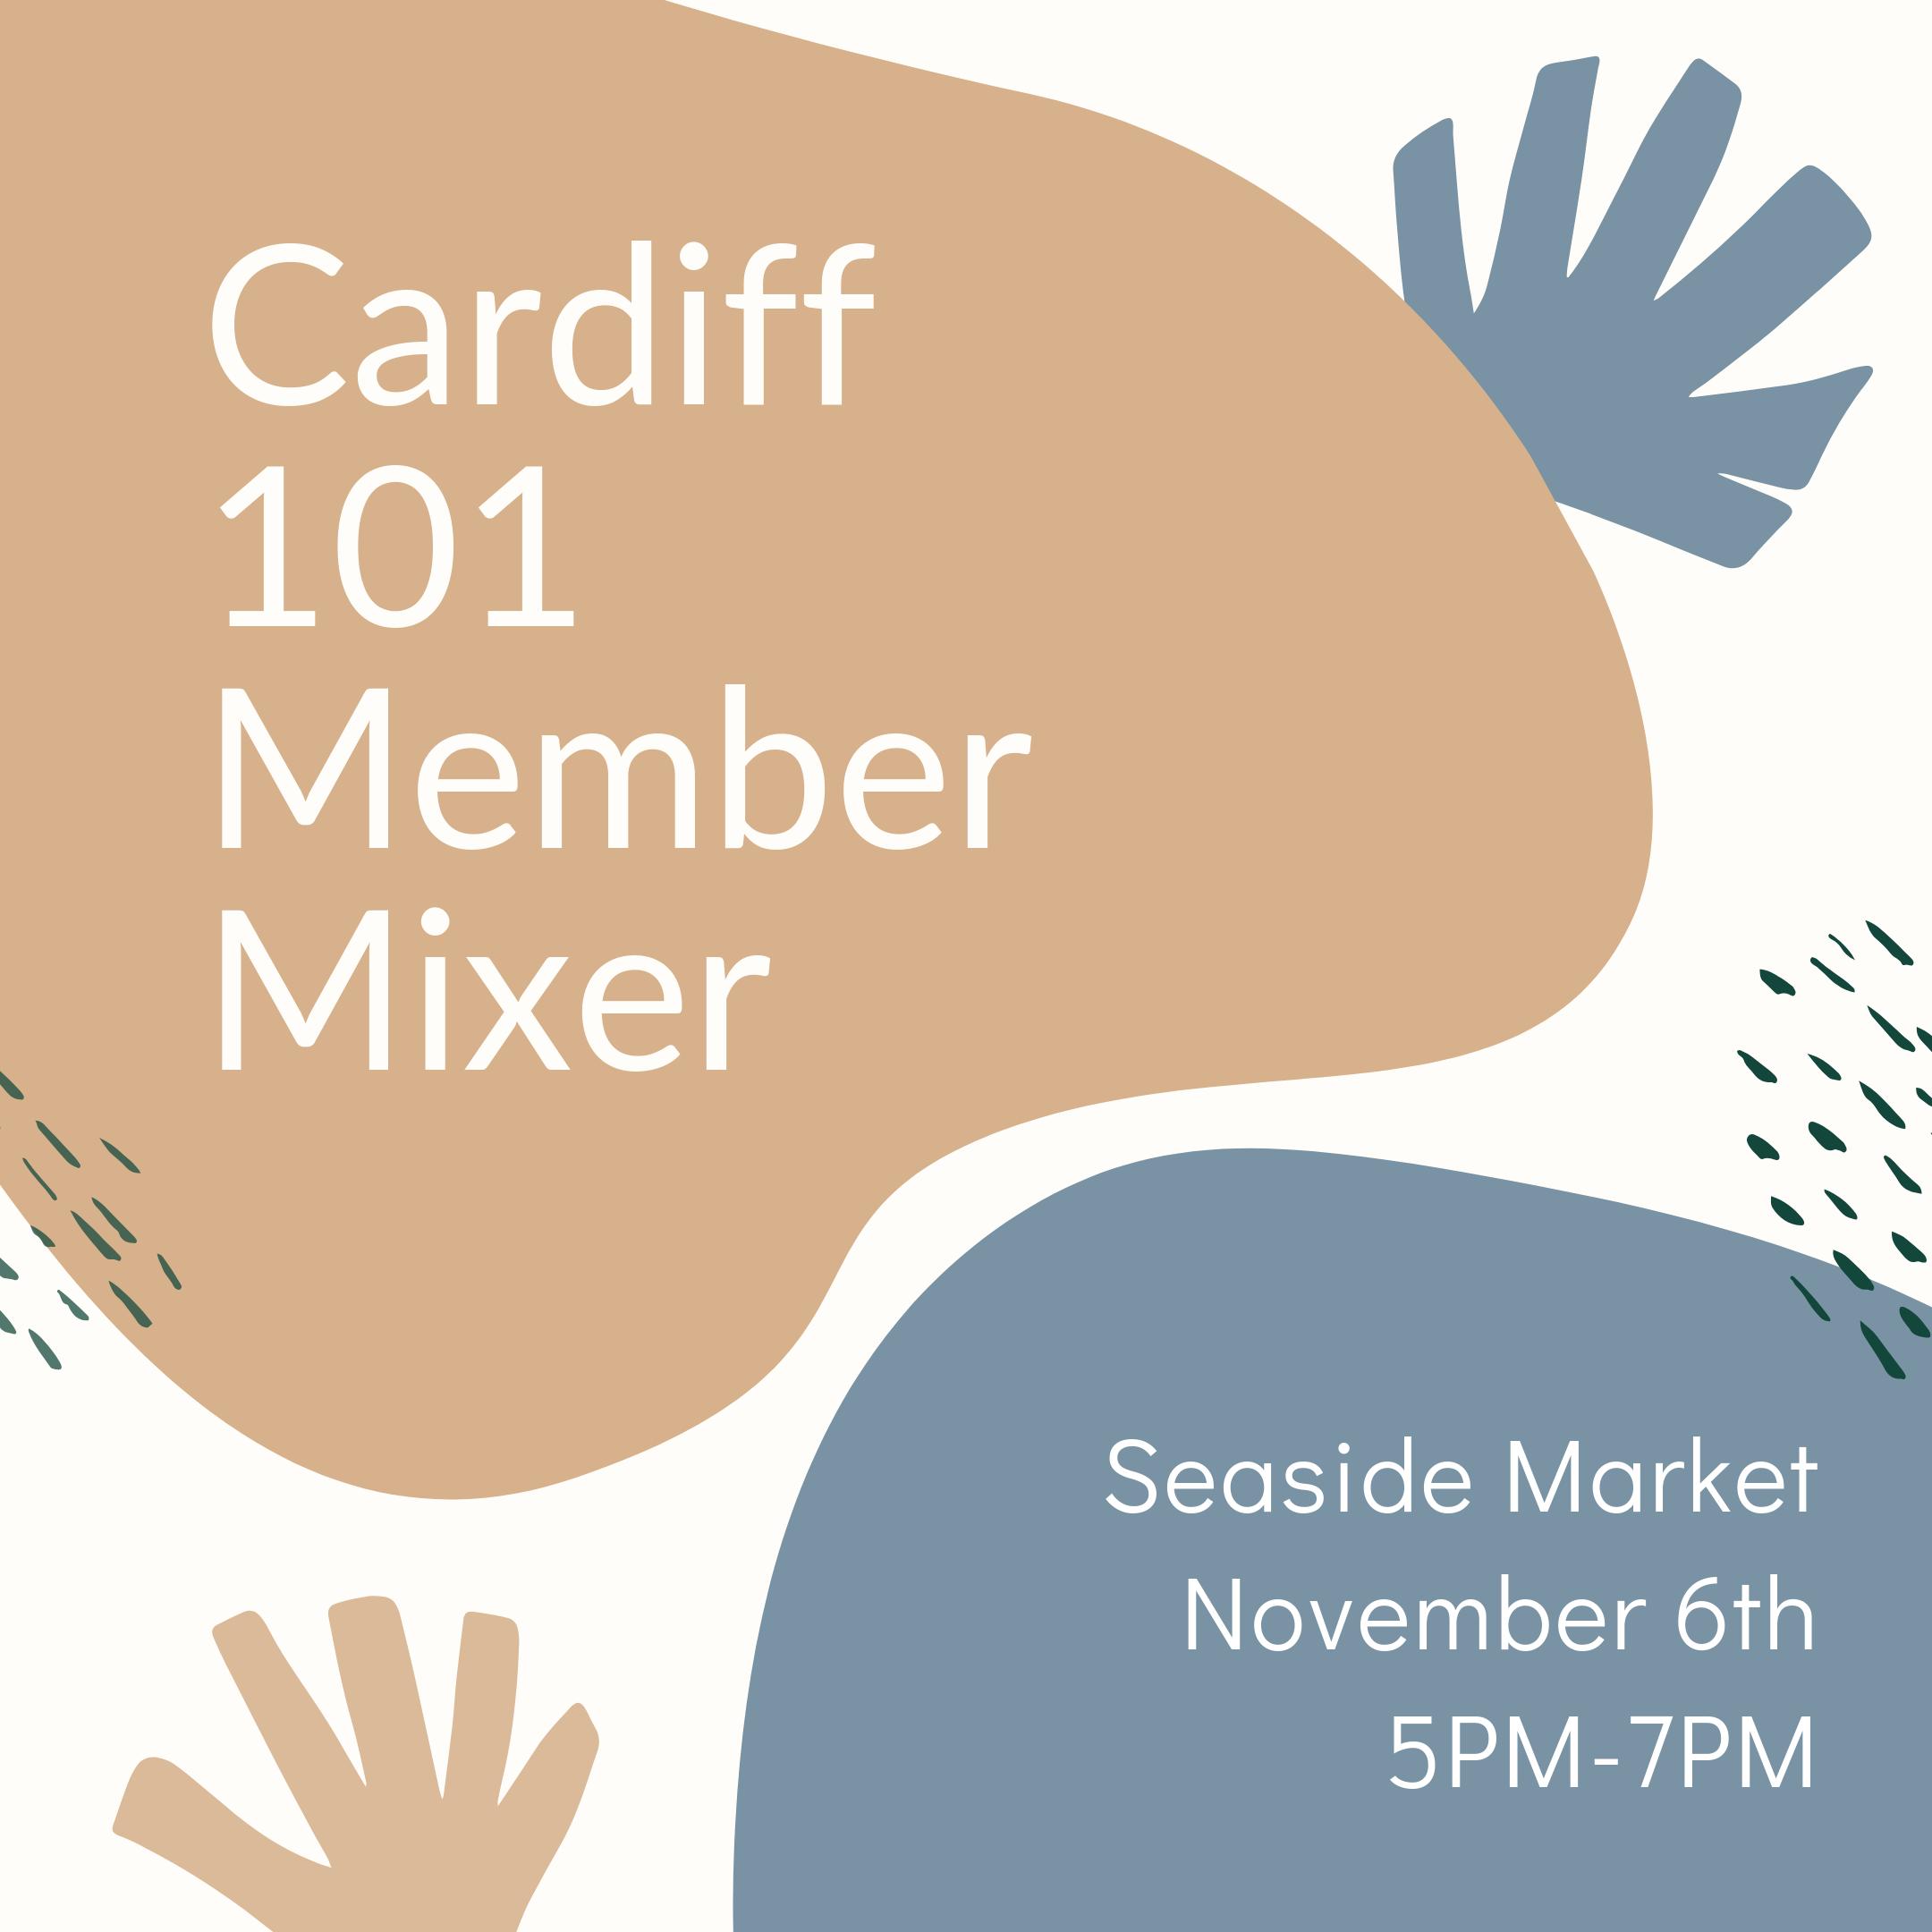 Cardiff 101 Member Mixer 3.PNG